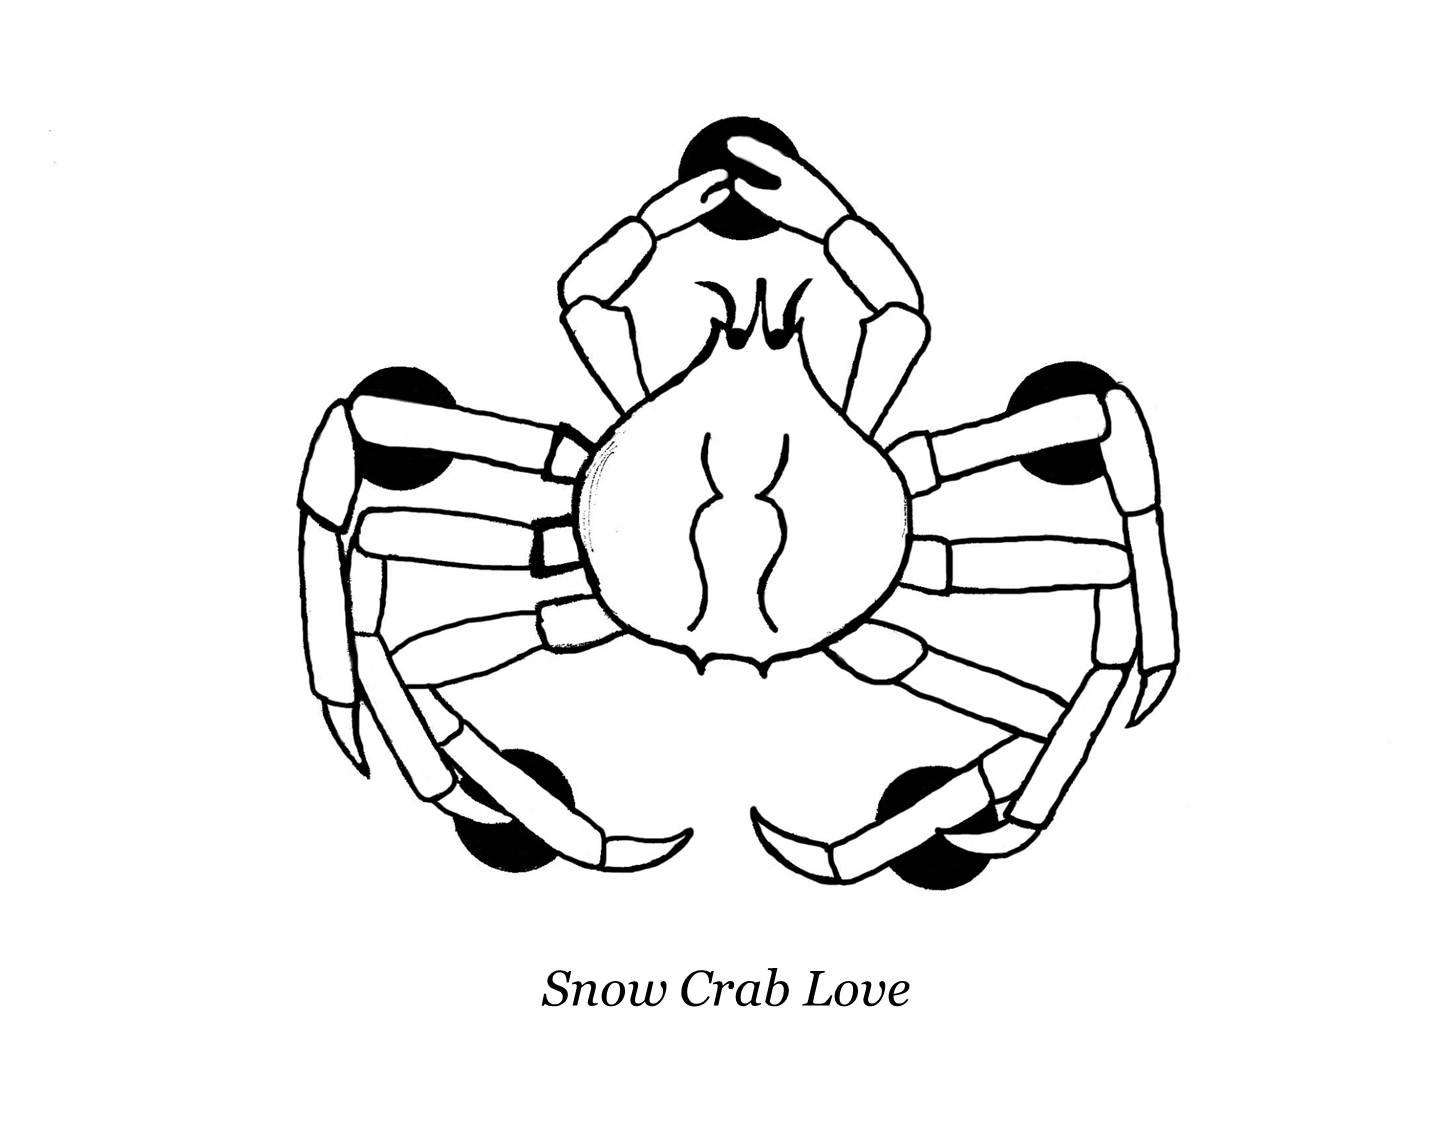 1456x1125 Snow Crab Love October 2011